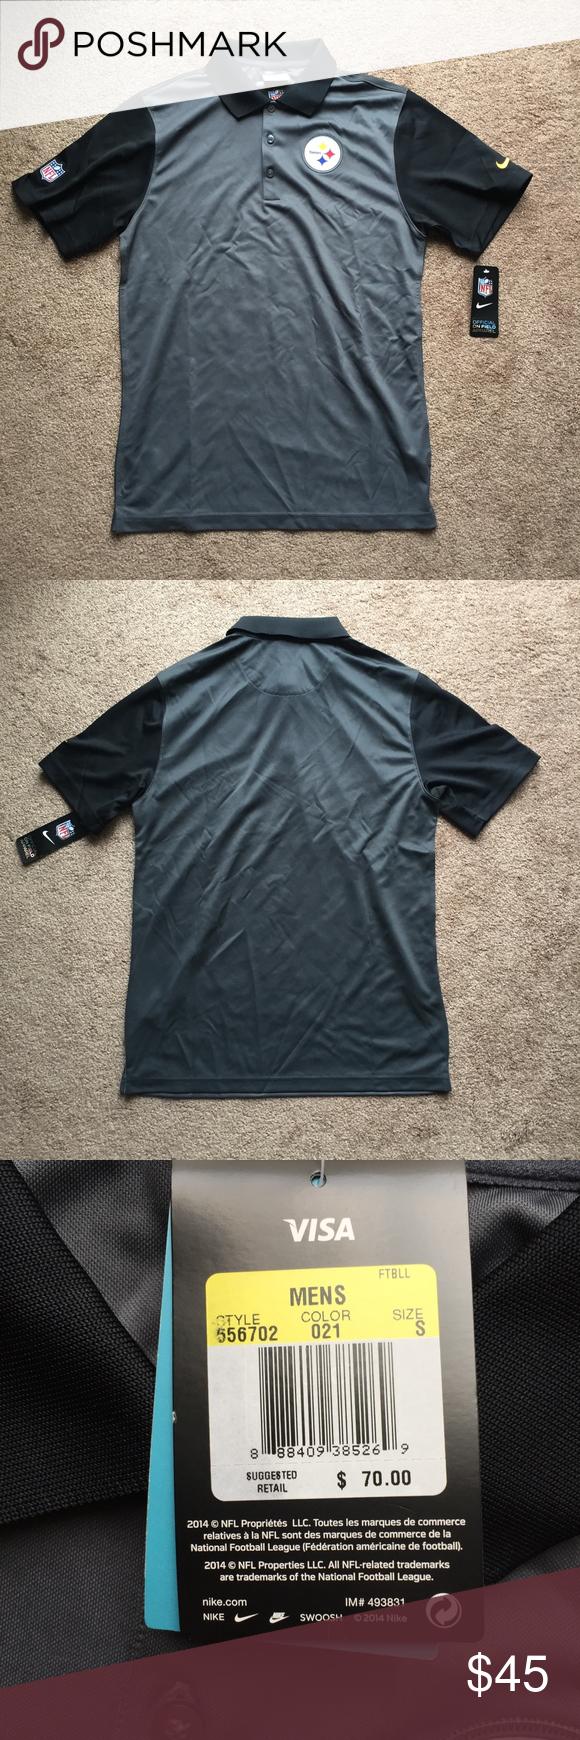 332eed94aa8 Nike Pittsburgh Steelers Dri-Fit Polo Small NWT Brand new